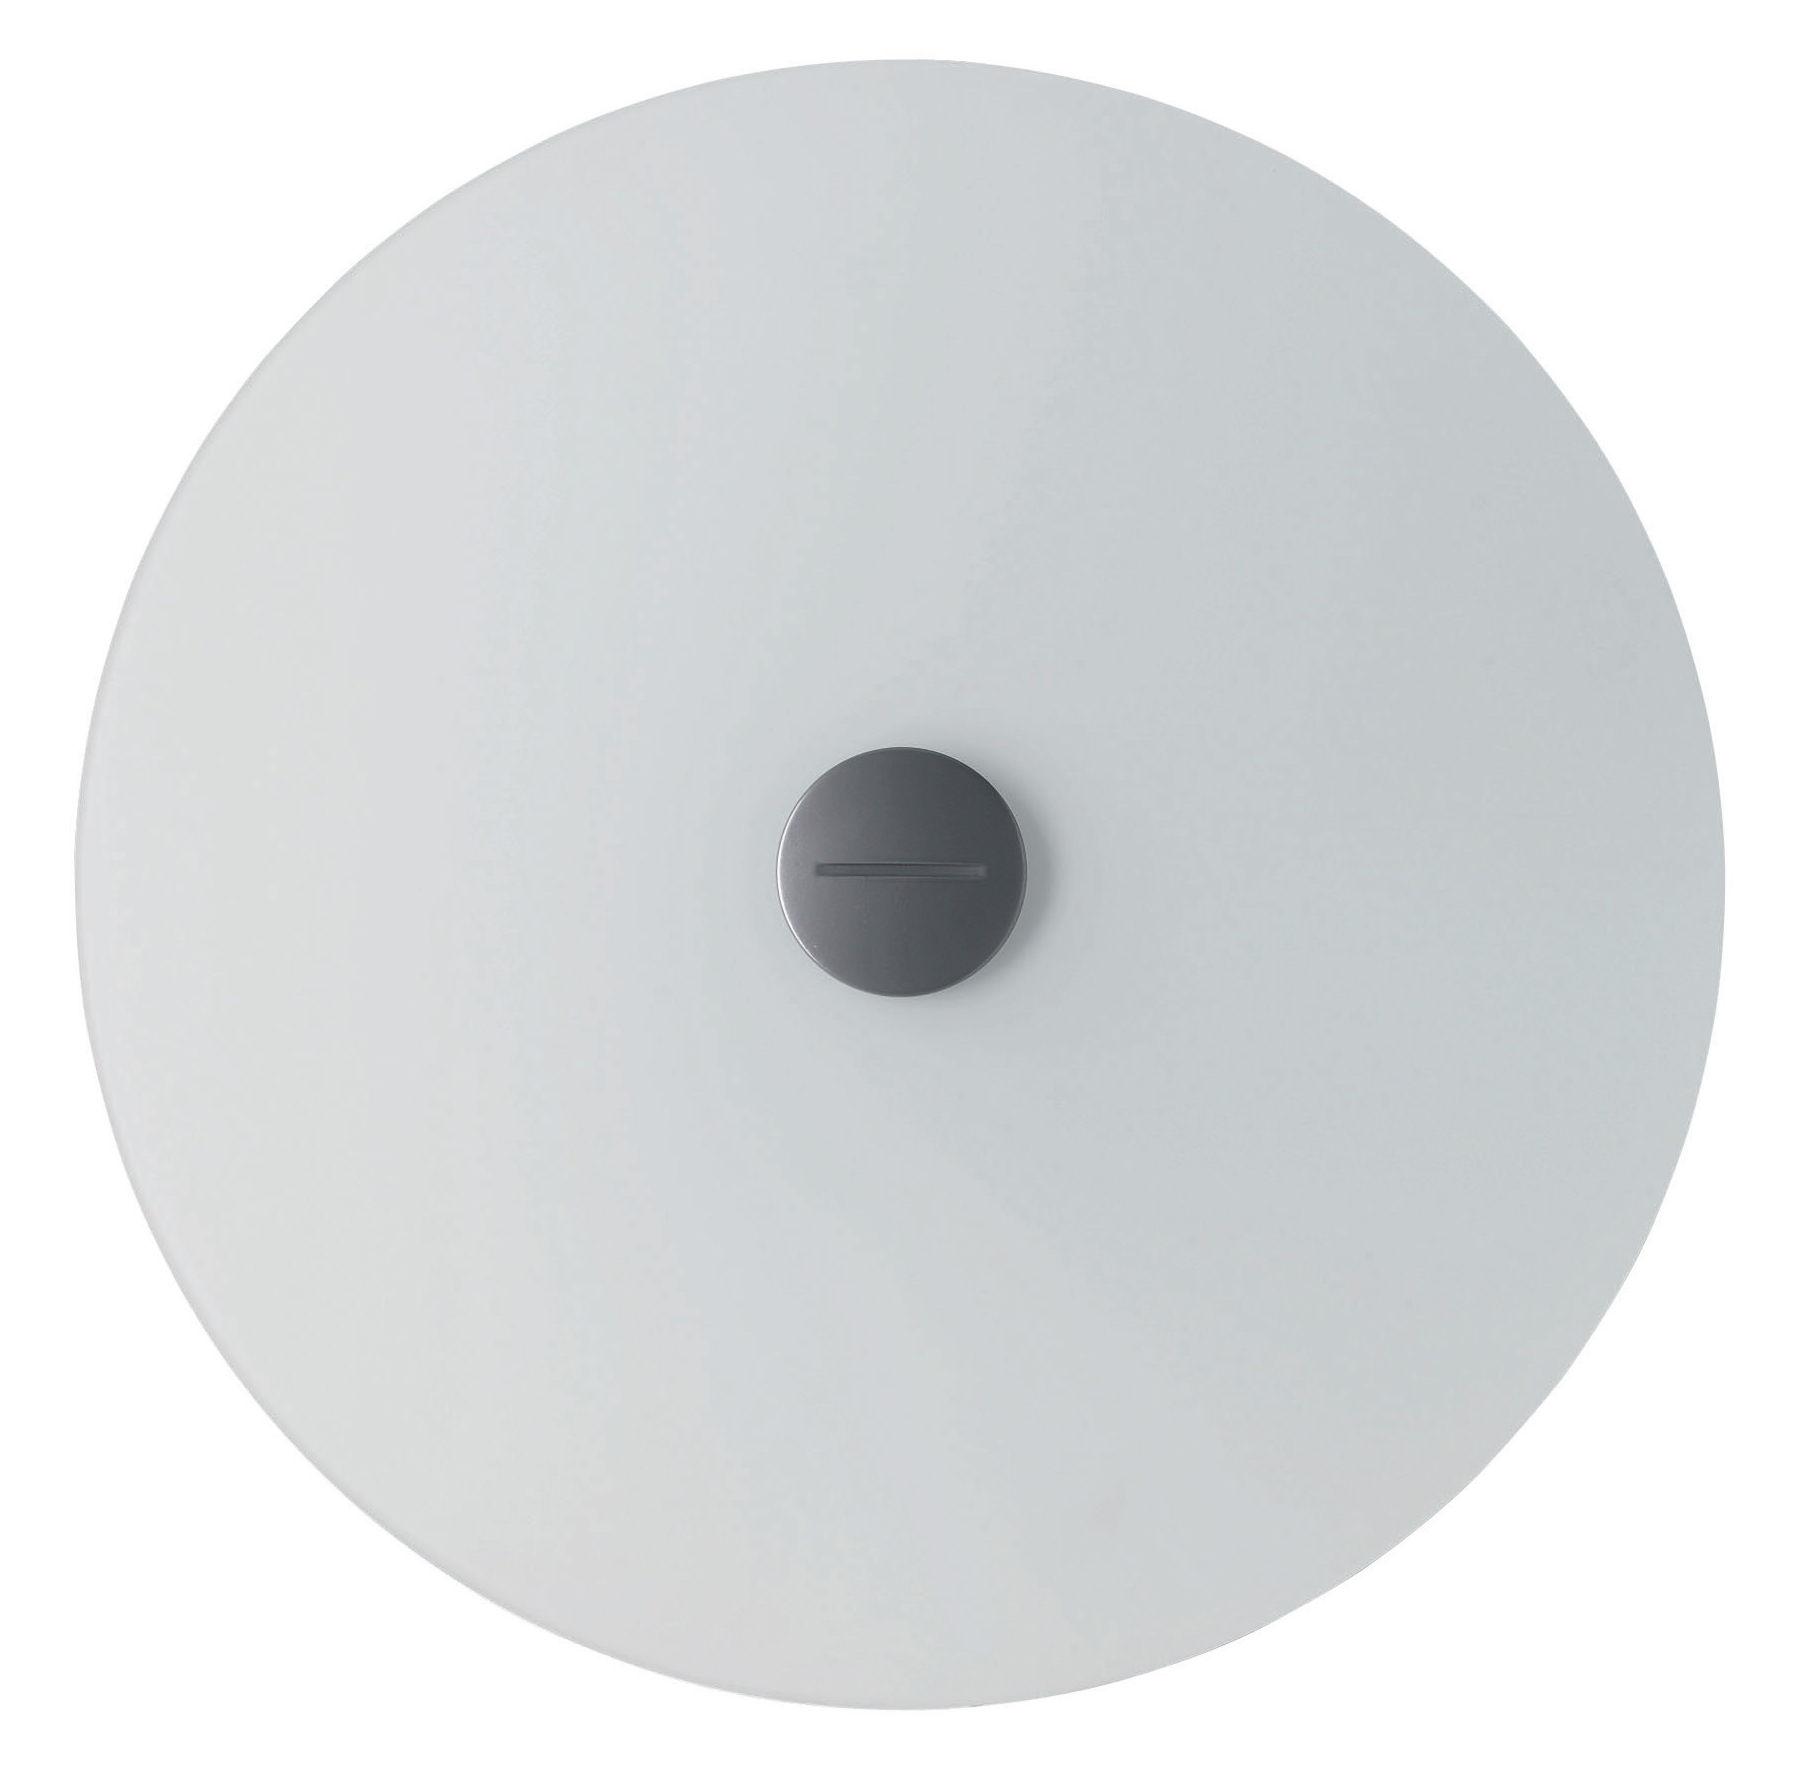 Lighting - Wall Lights - Bit 3 Wall light with plug by Foscarini - White - Glass, Metal